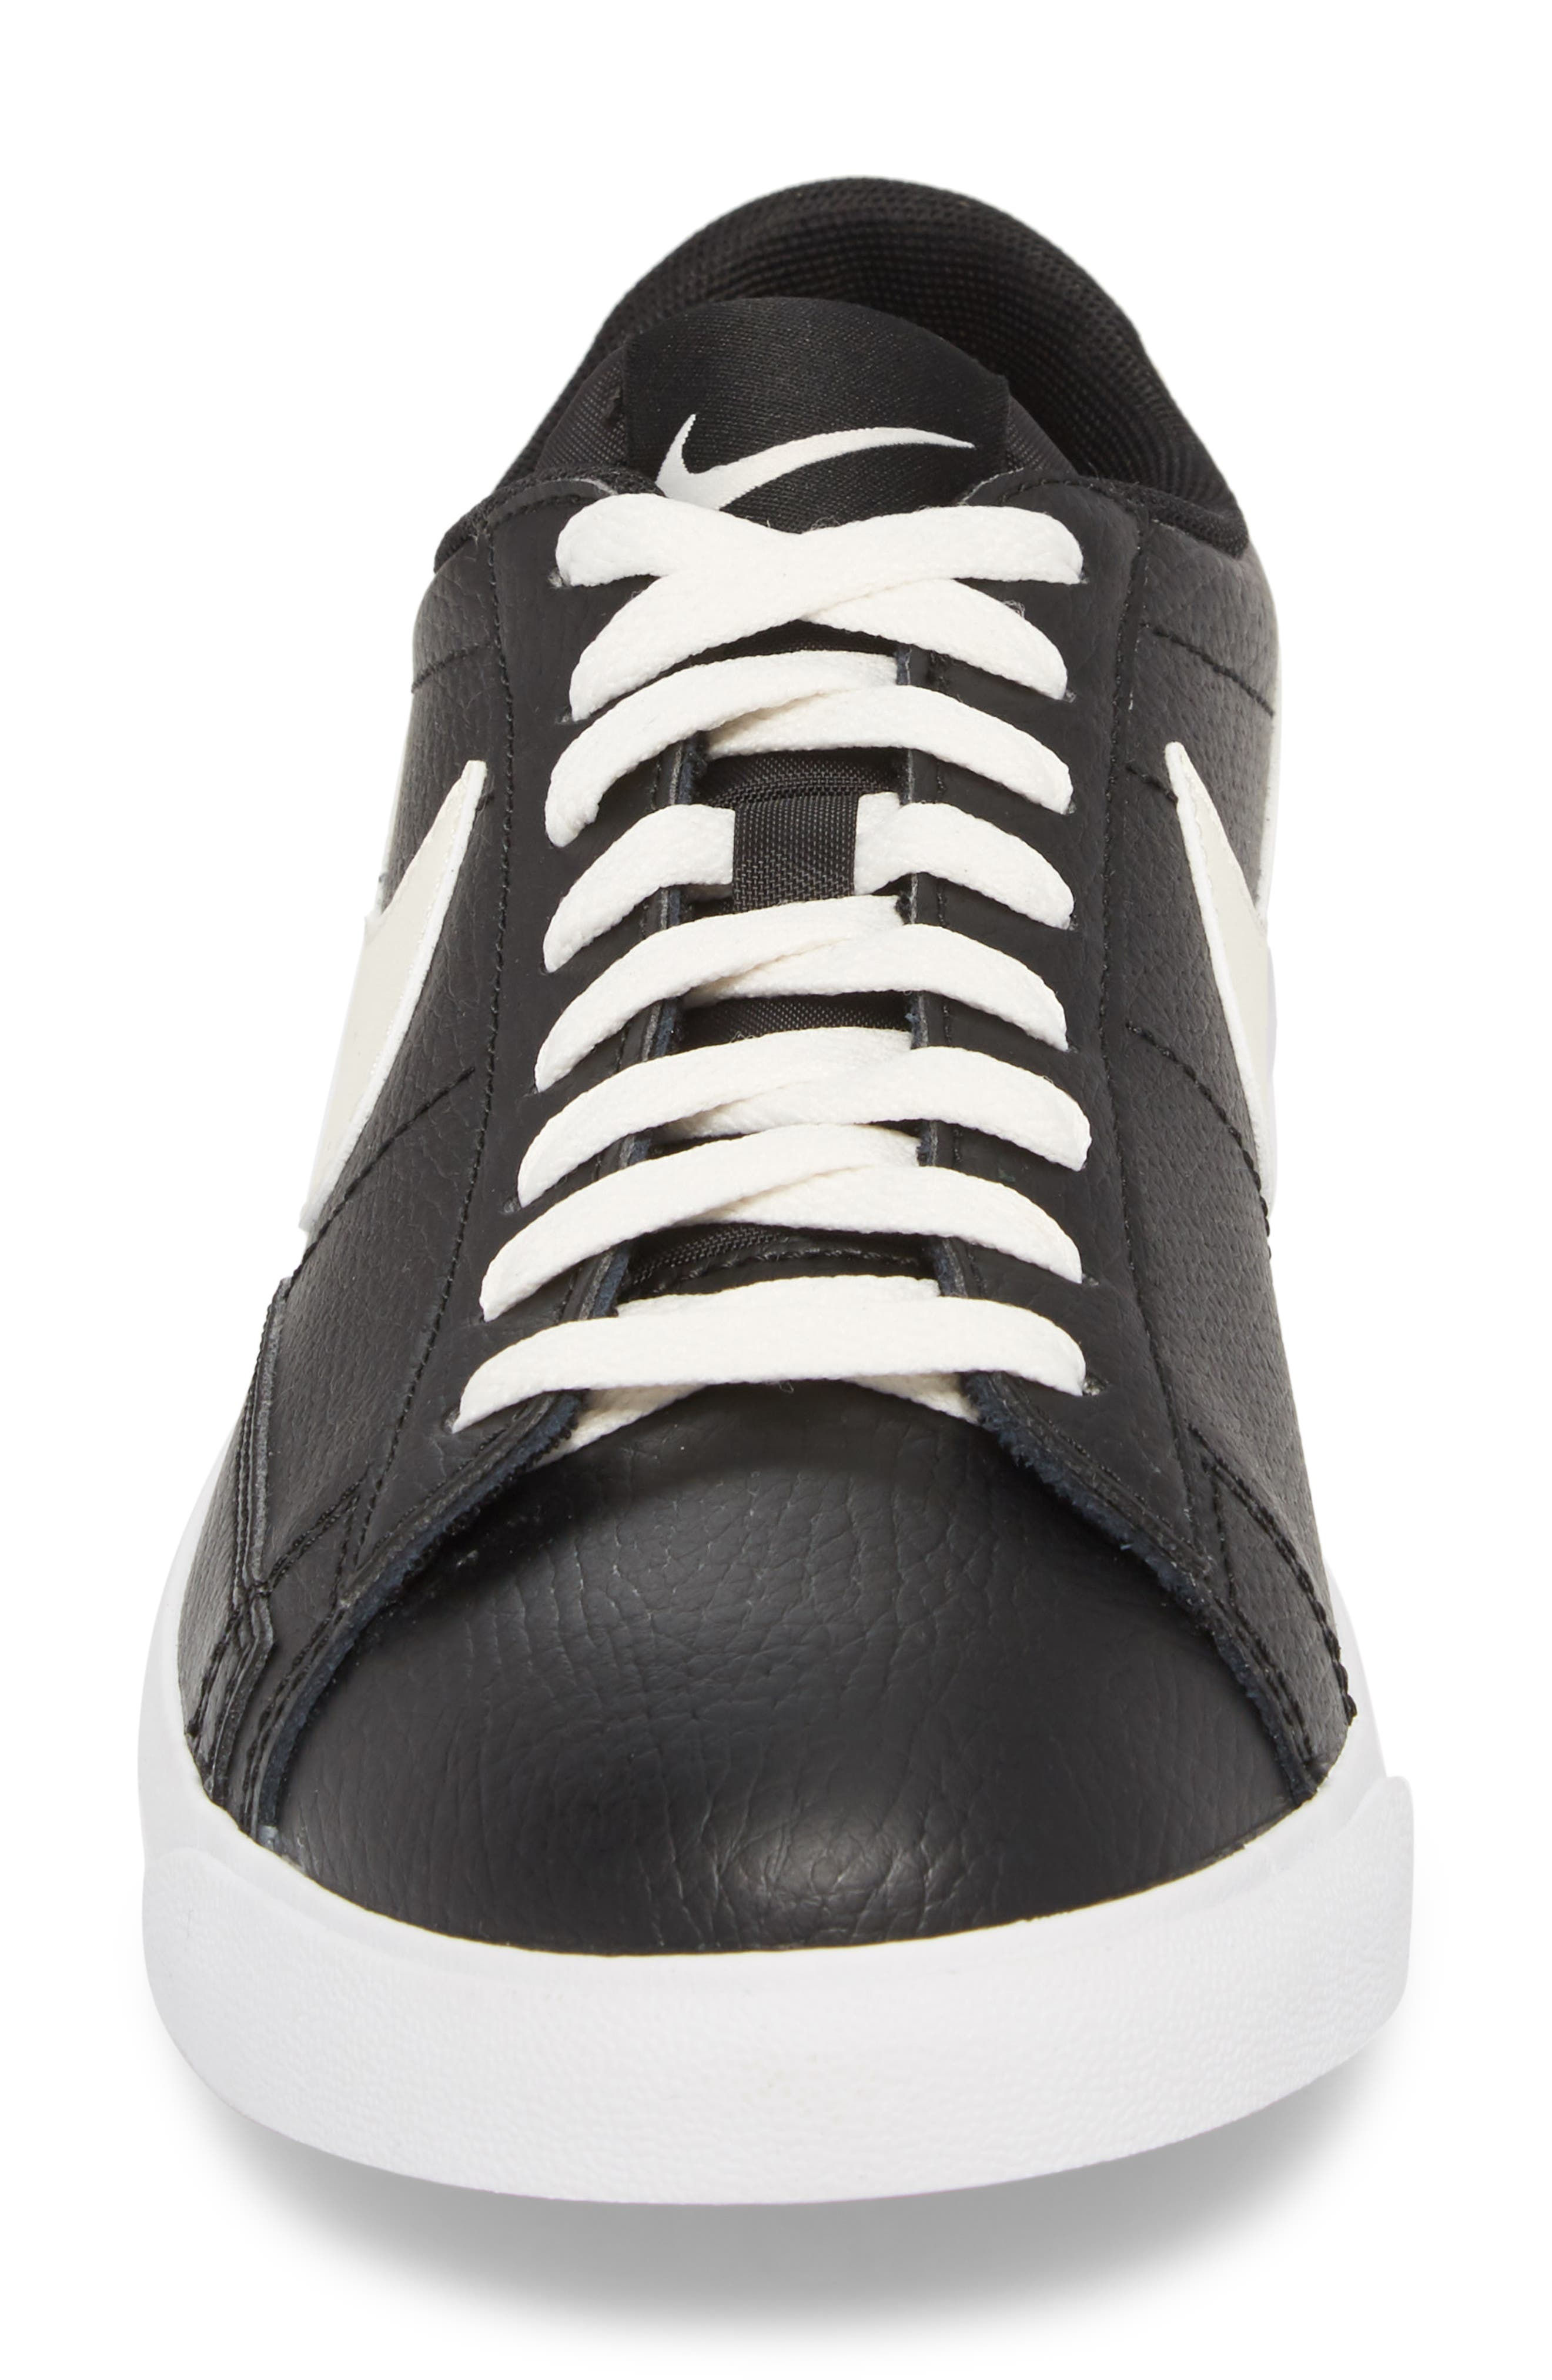 Blazer Low Leather Sneaker,                             Alternate thumbnail 4, color,                             Black/ Sail